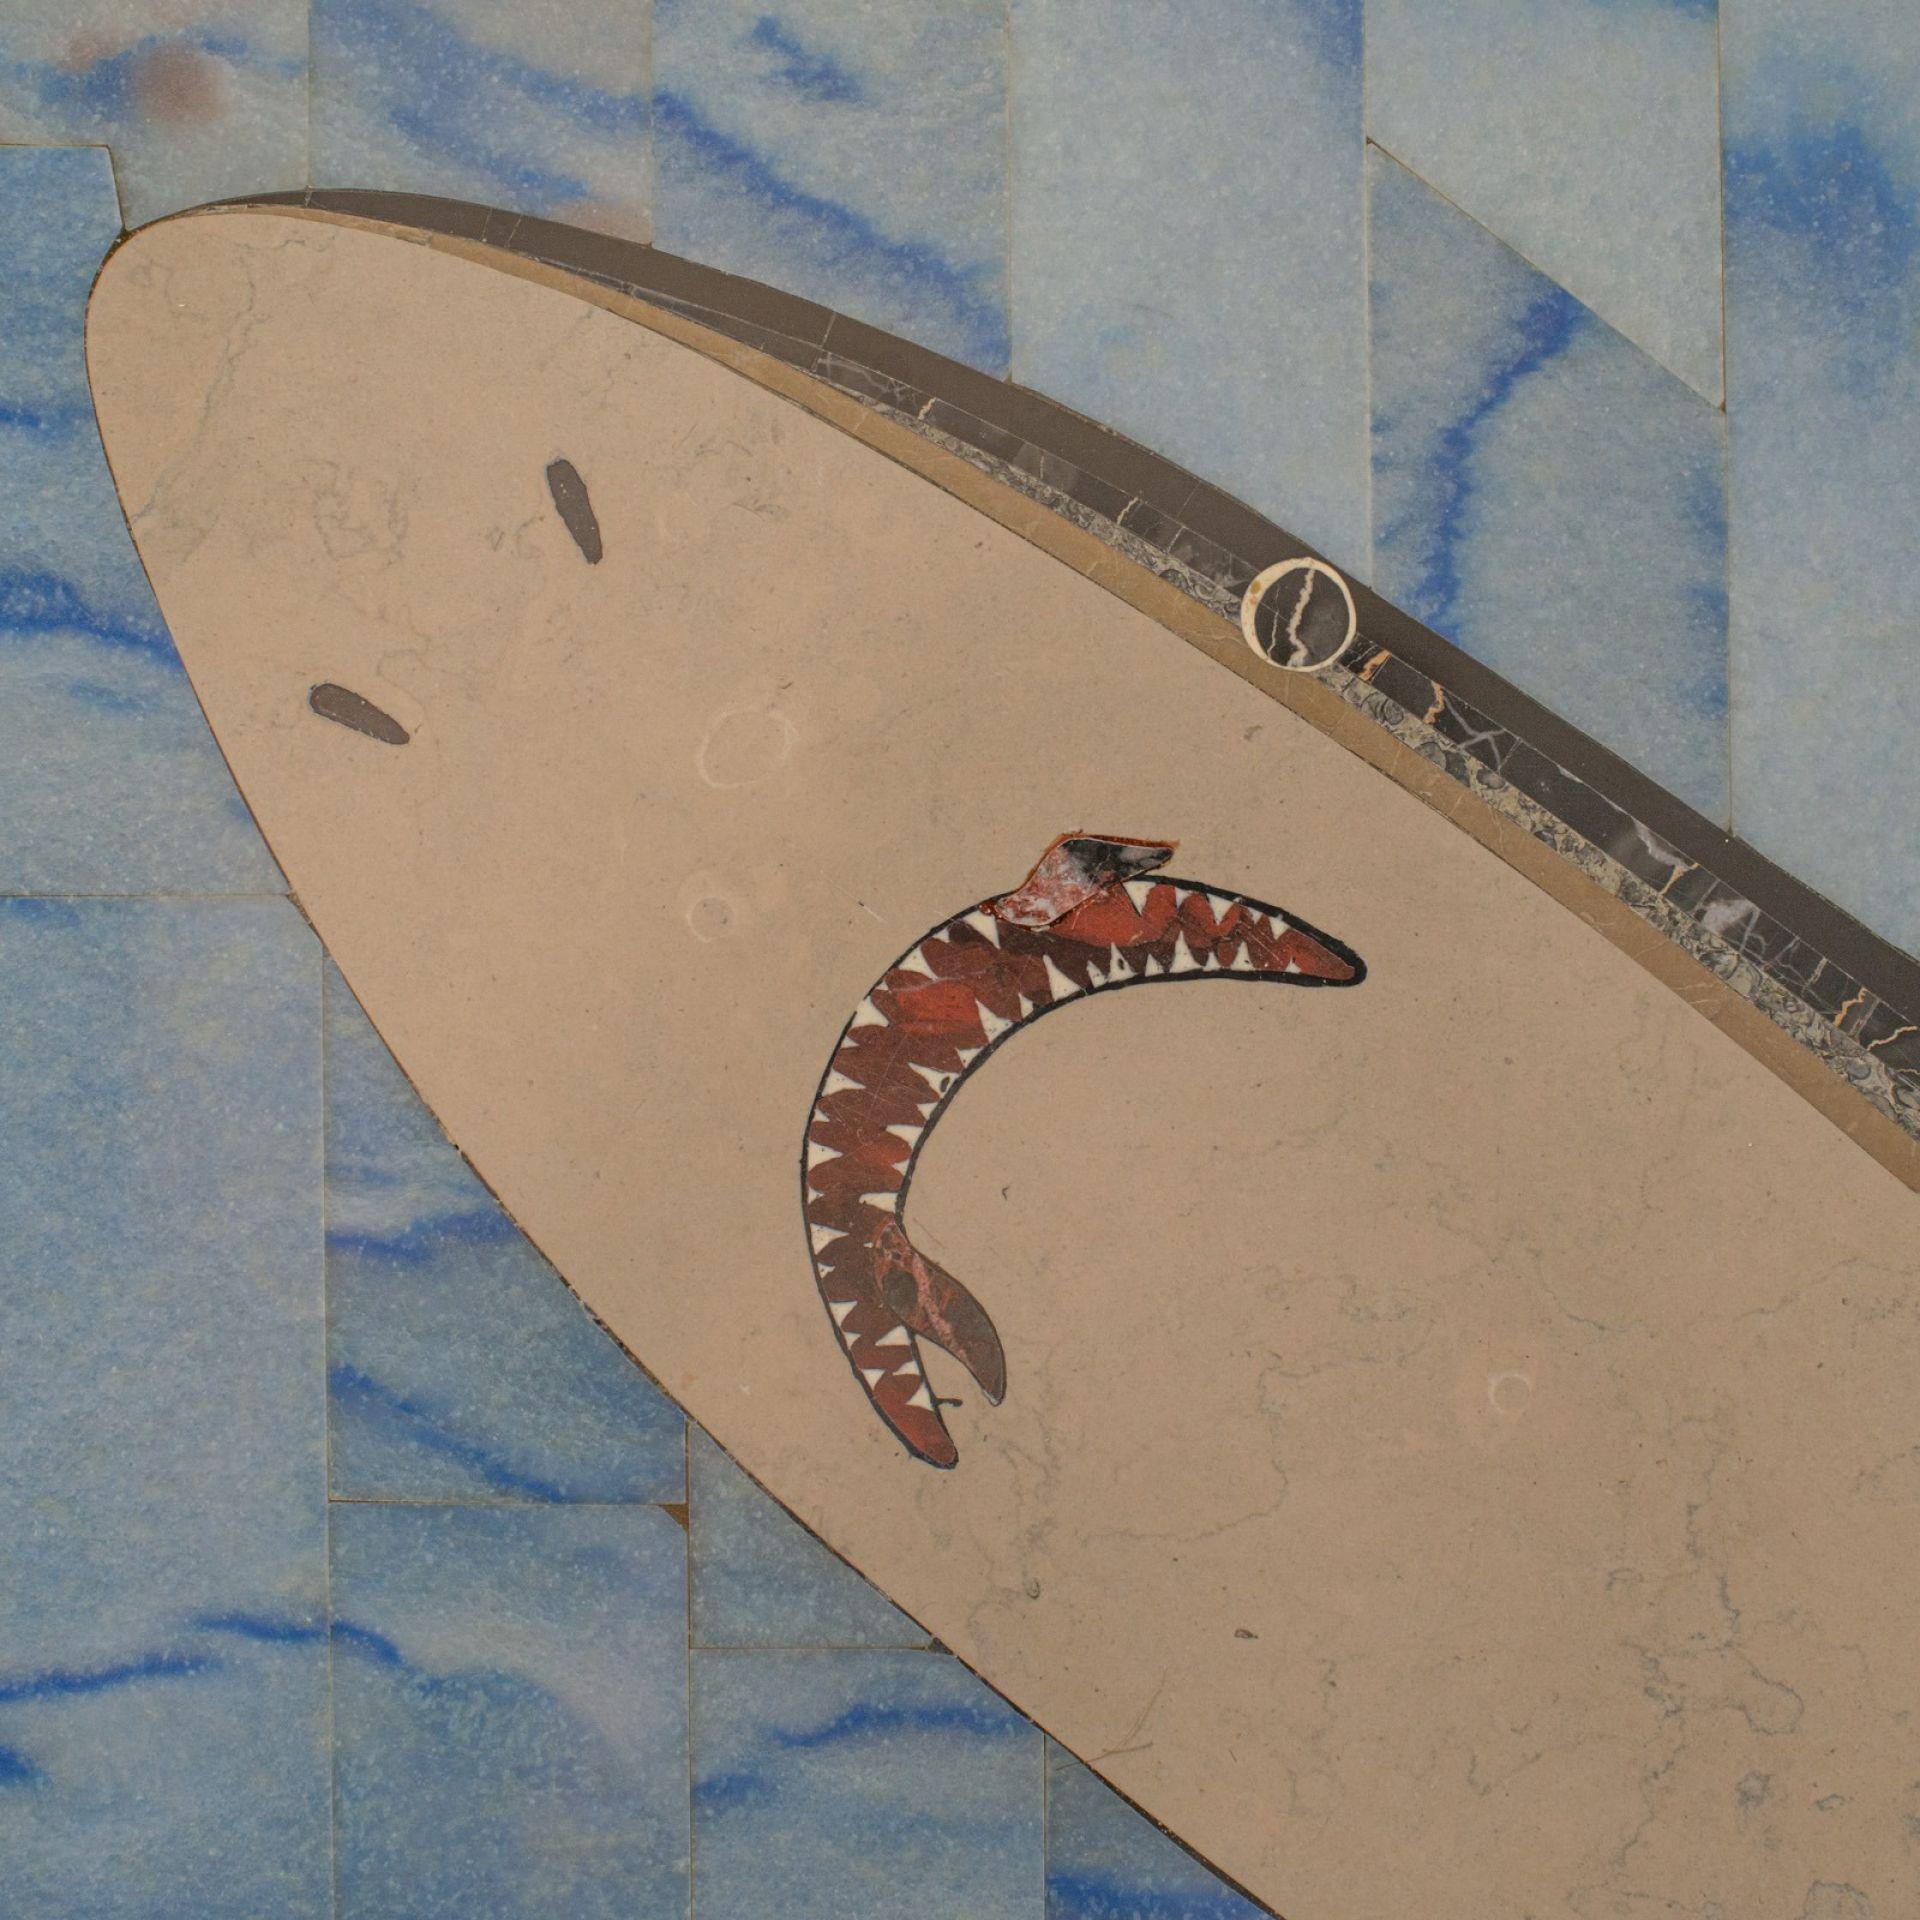 Scheiders Nightmare, Table, Shark, Singer, English, Pietra Dura, Dominic Hurley